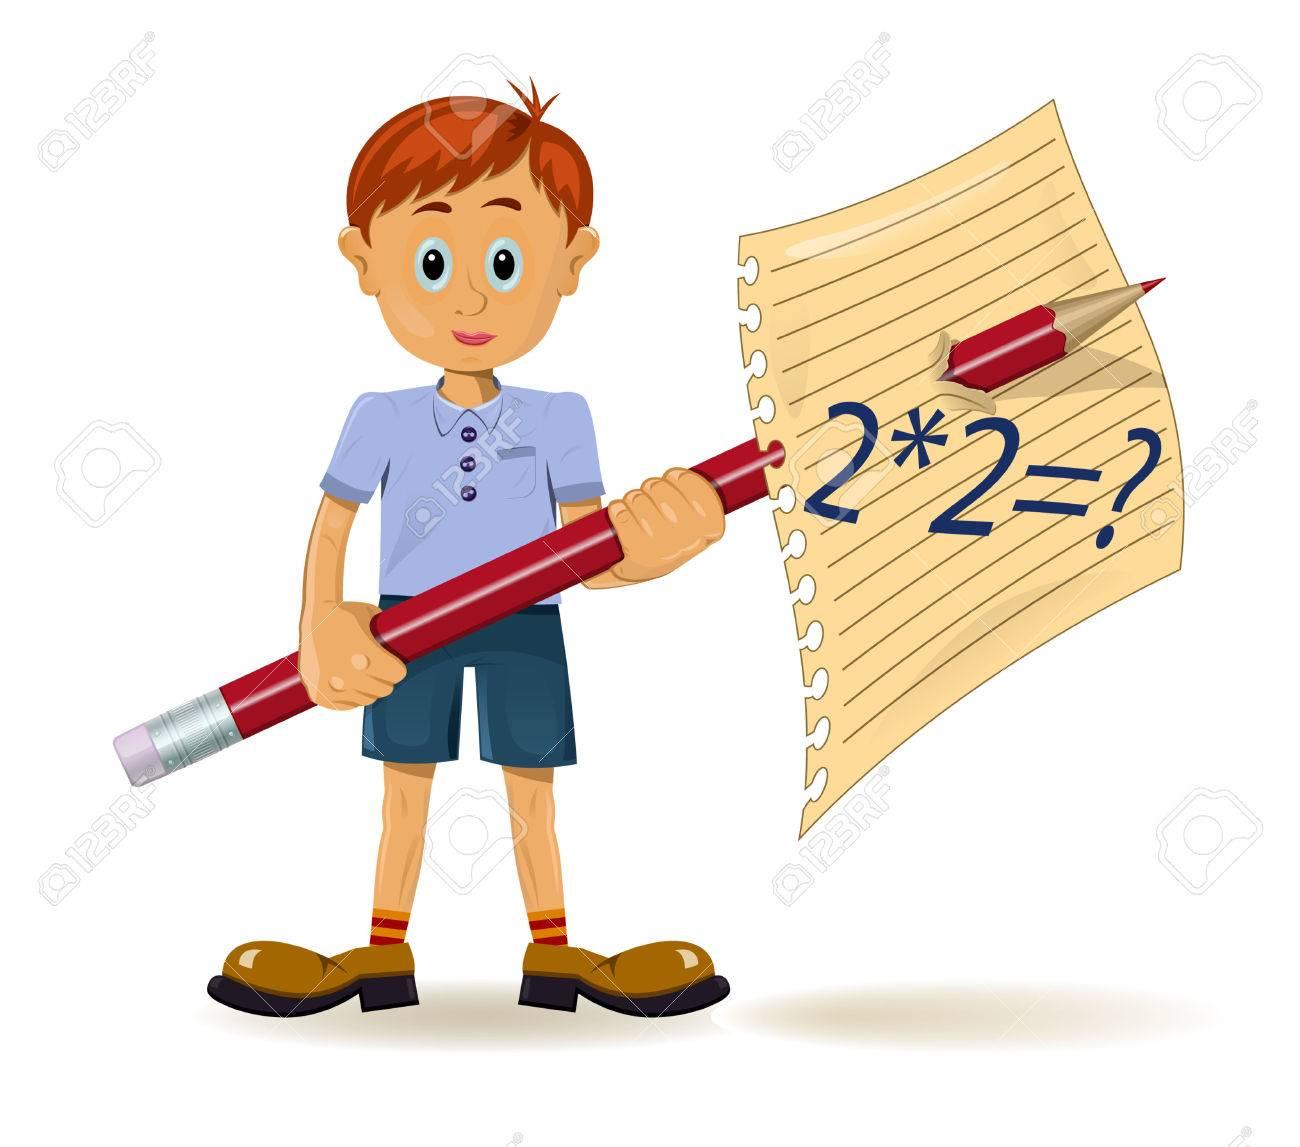 Boy And Pencil. Funny Cartoon Character Royalty Free Cliparts ...